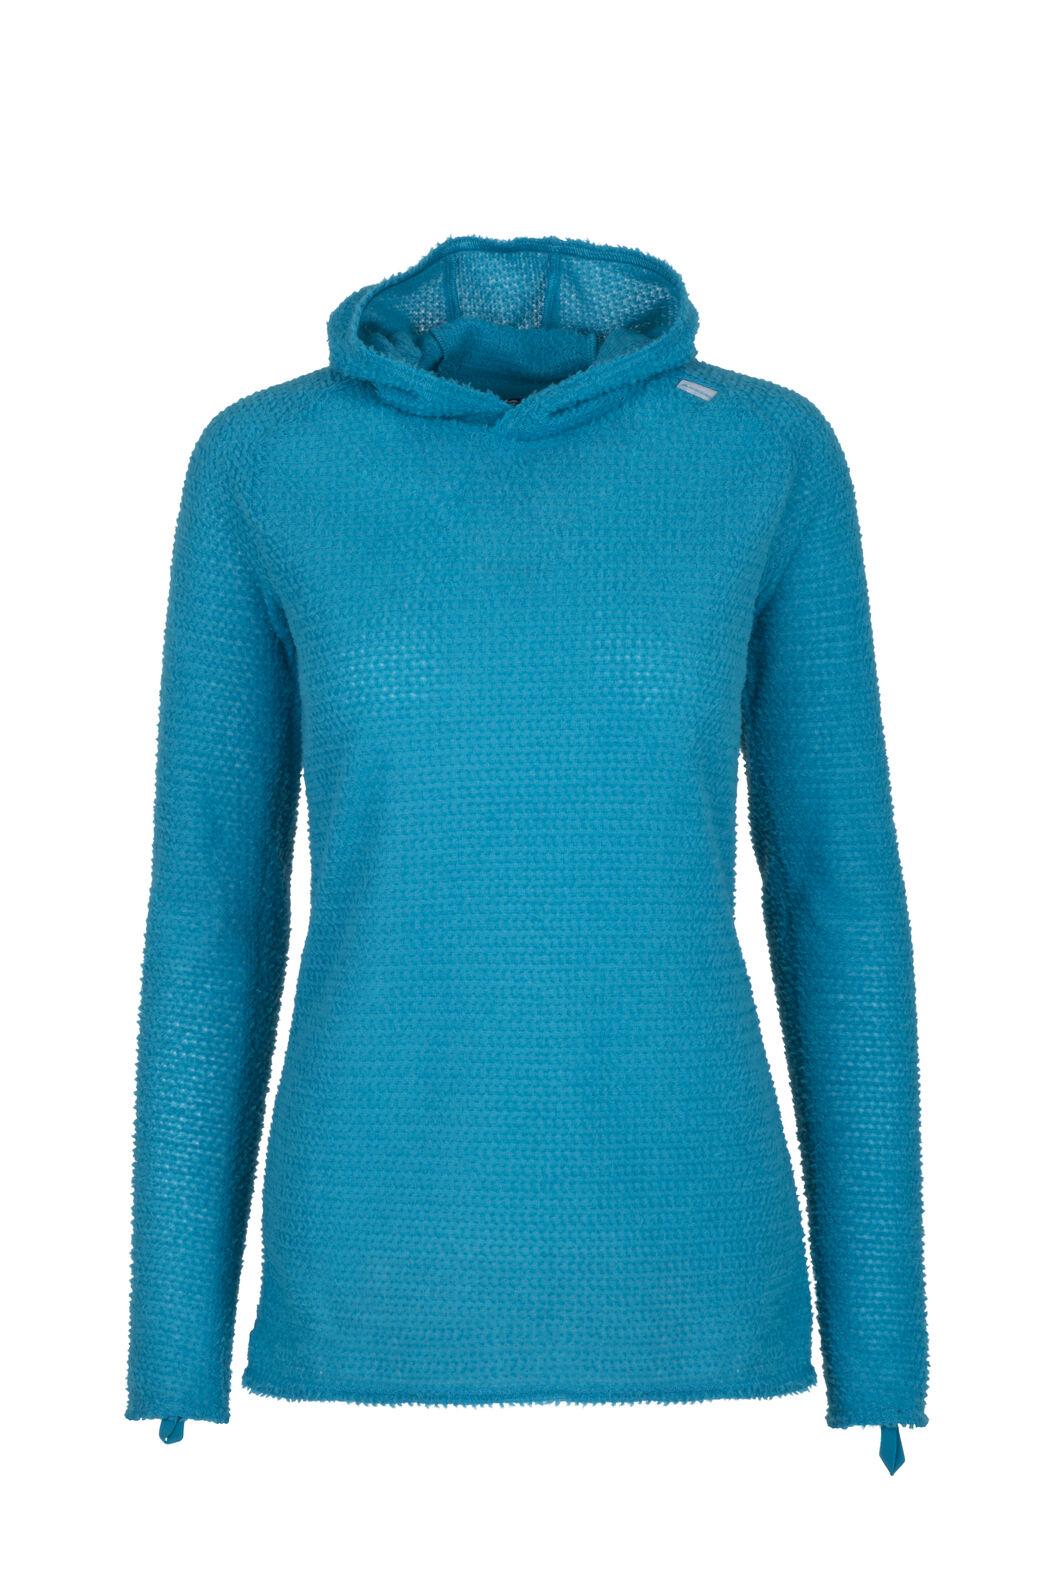 Macpac Nitro Polartec® Alpha® Pullover - Women's, Enamel Blue, hi-res